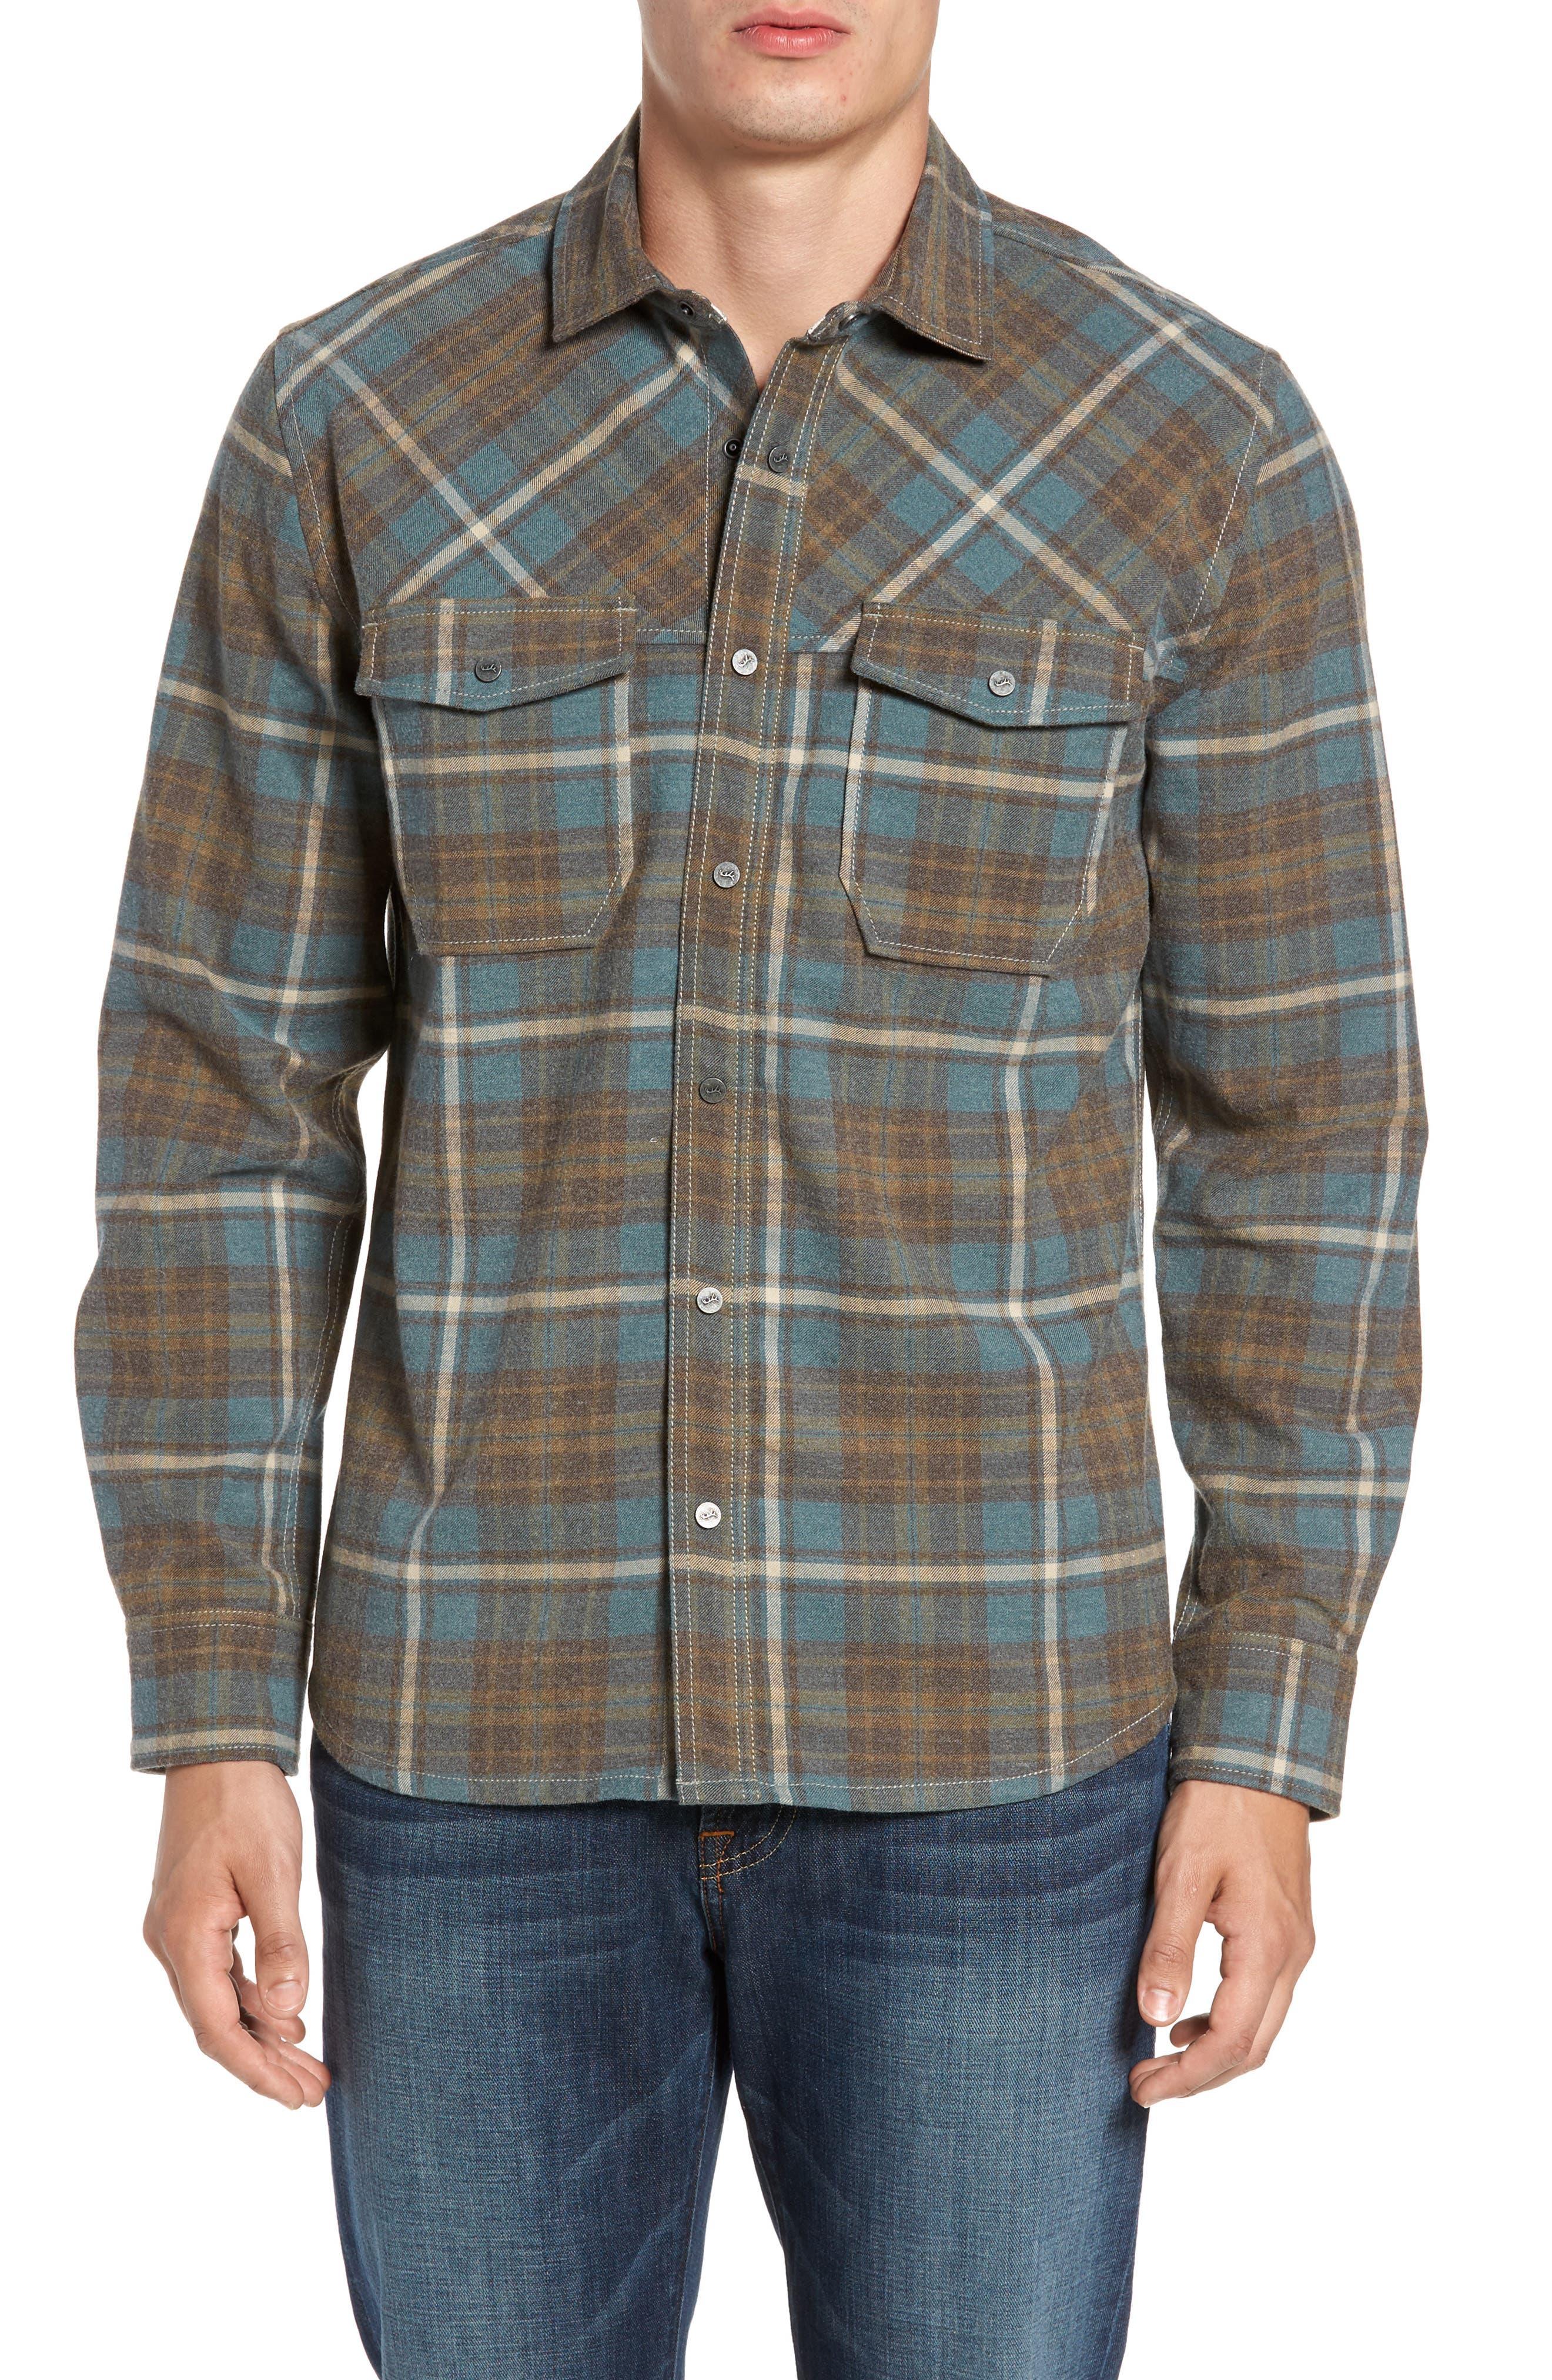 Ranger Plaid Shirt,                             Main thumbnail 1, color,                             424